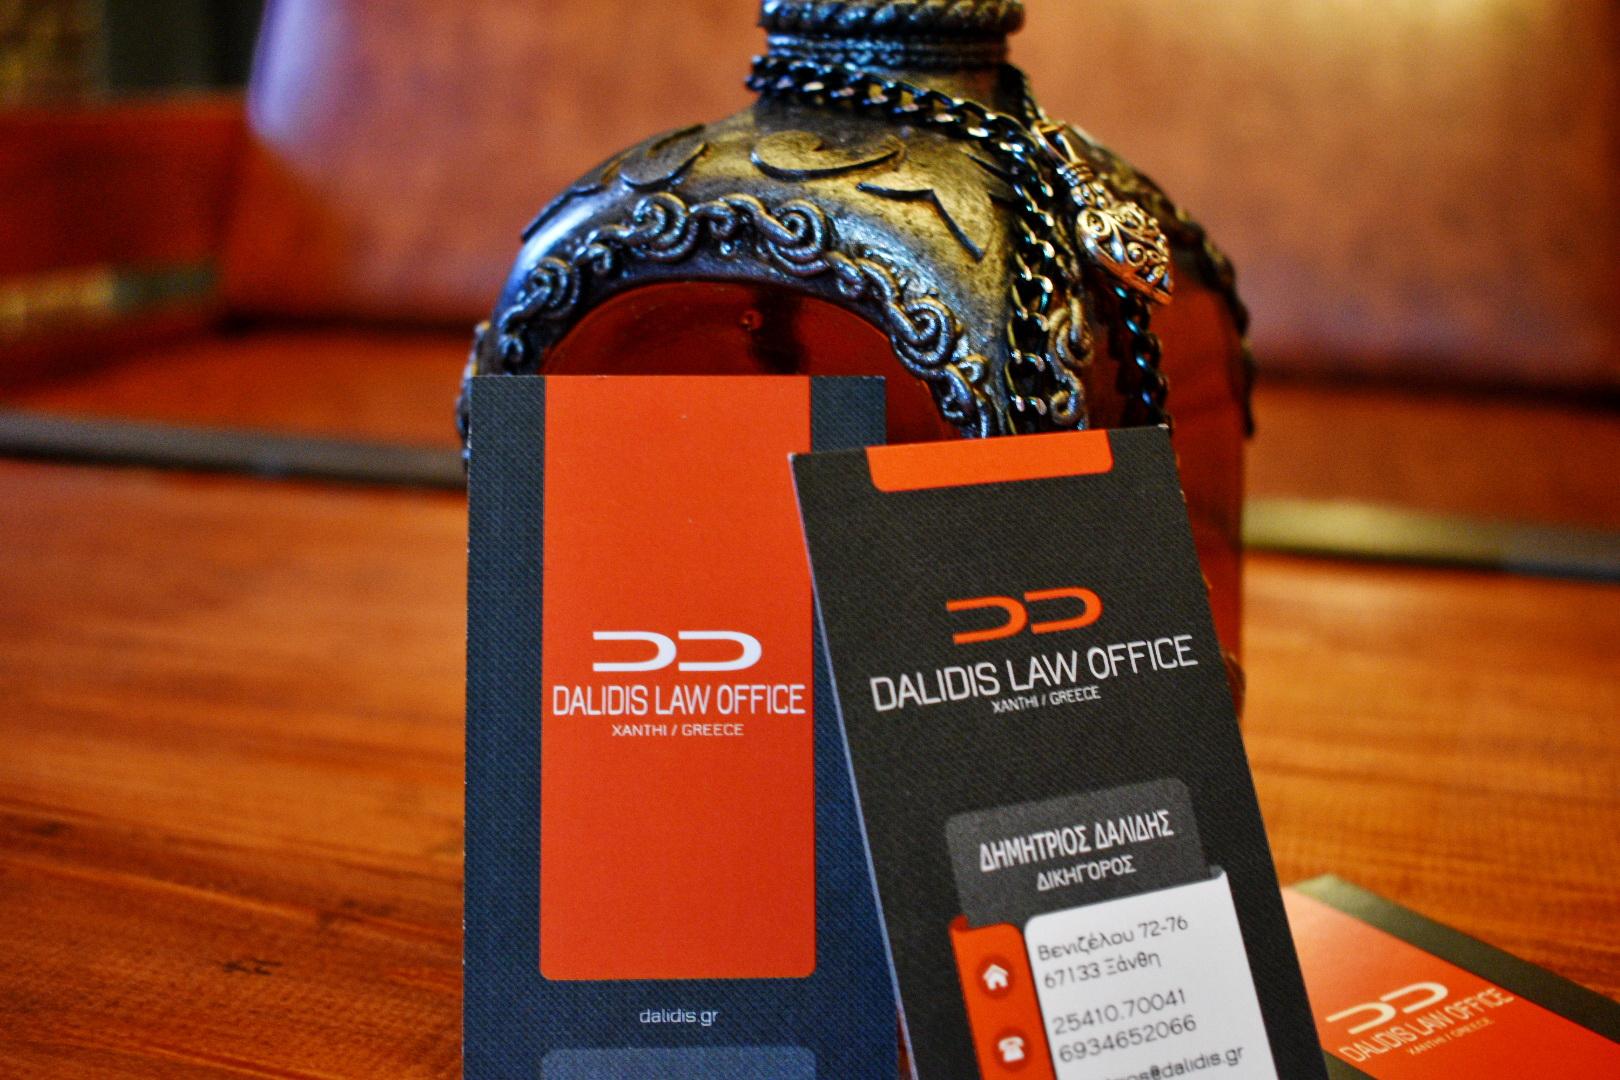 Dalidis_Law_Office